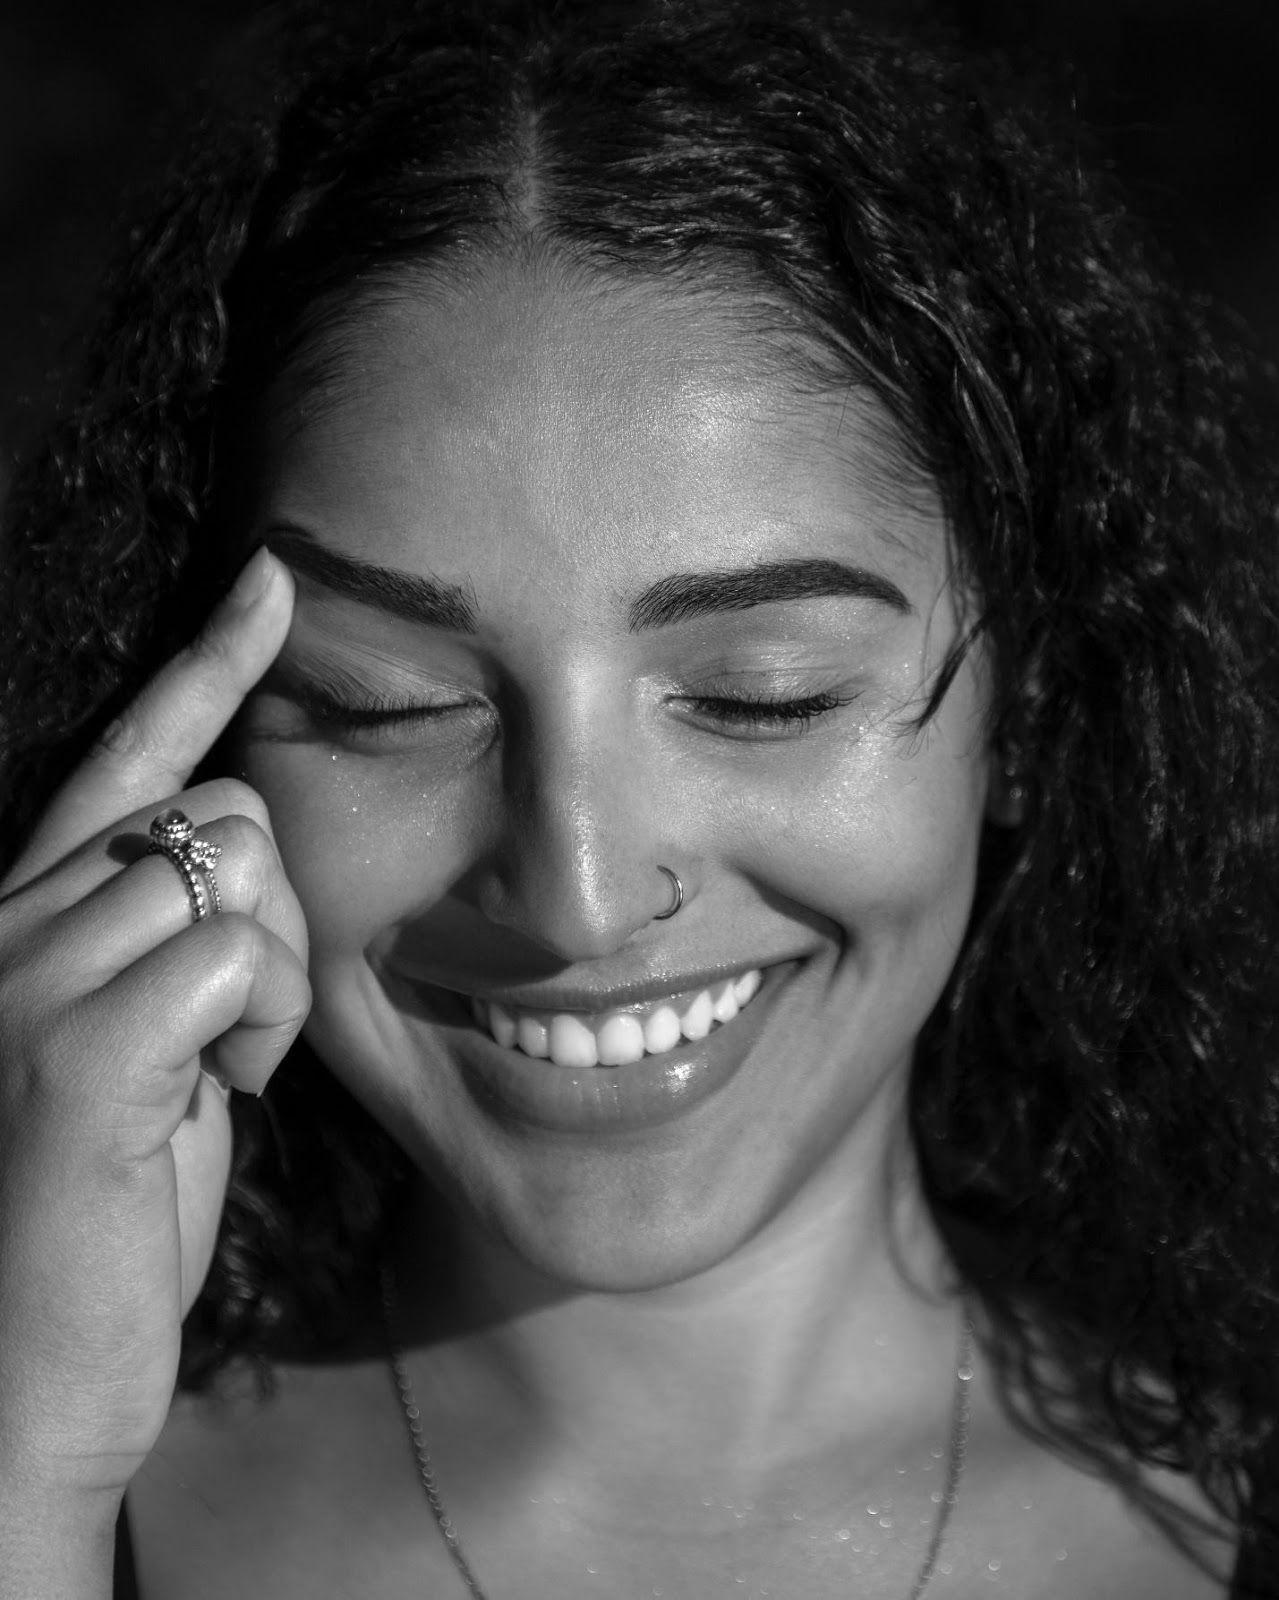 woman smiles and raises her eyebrow